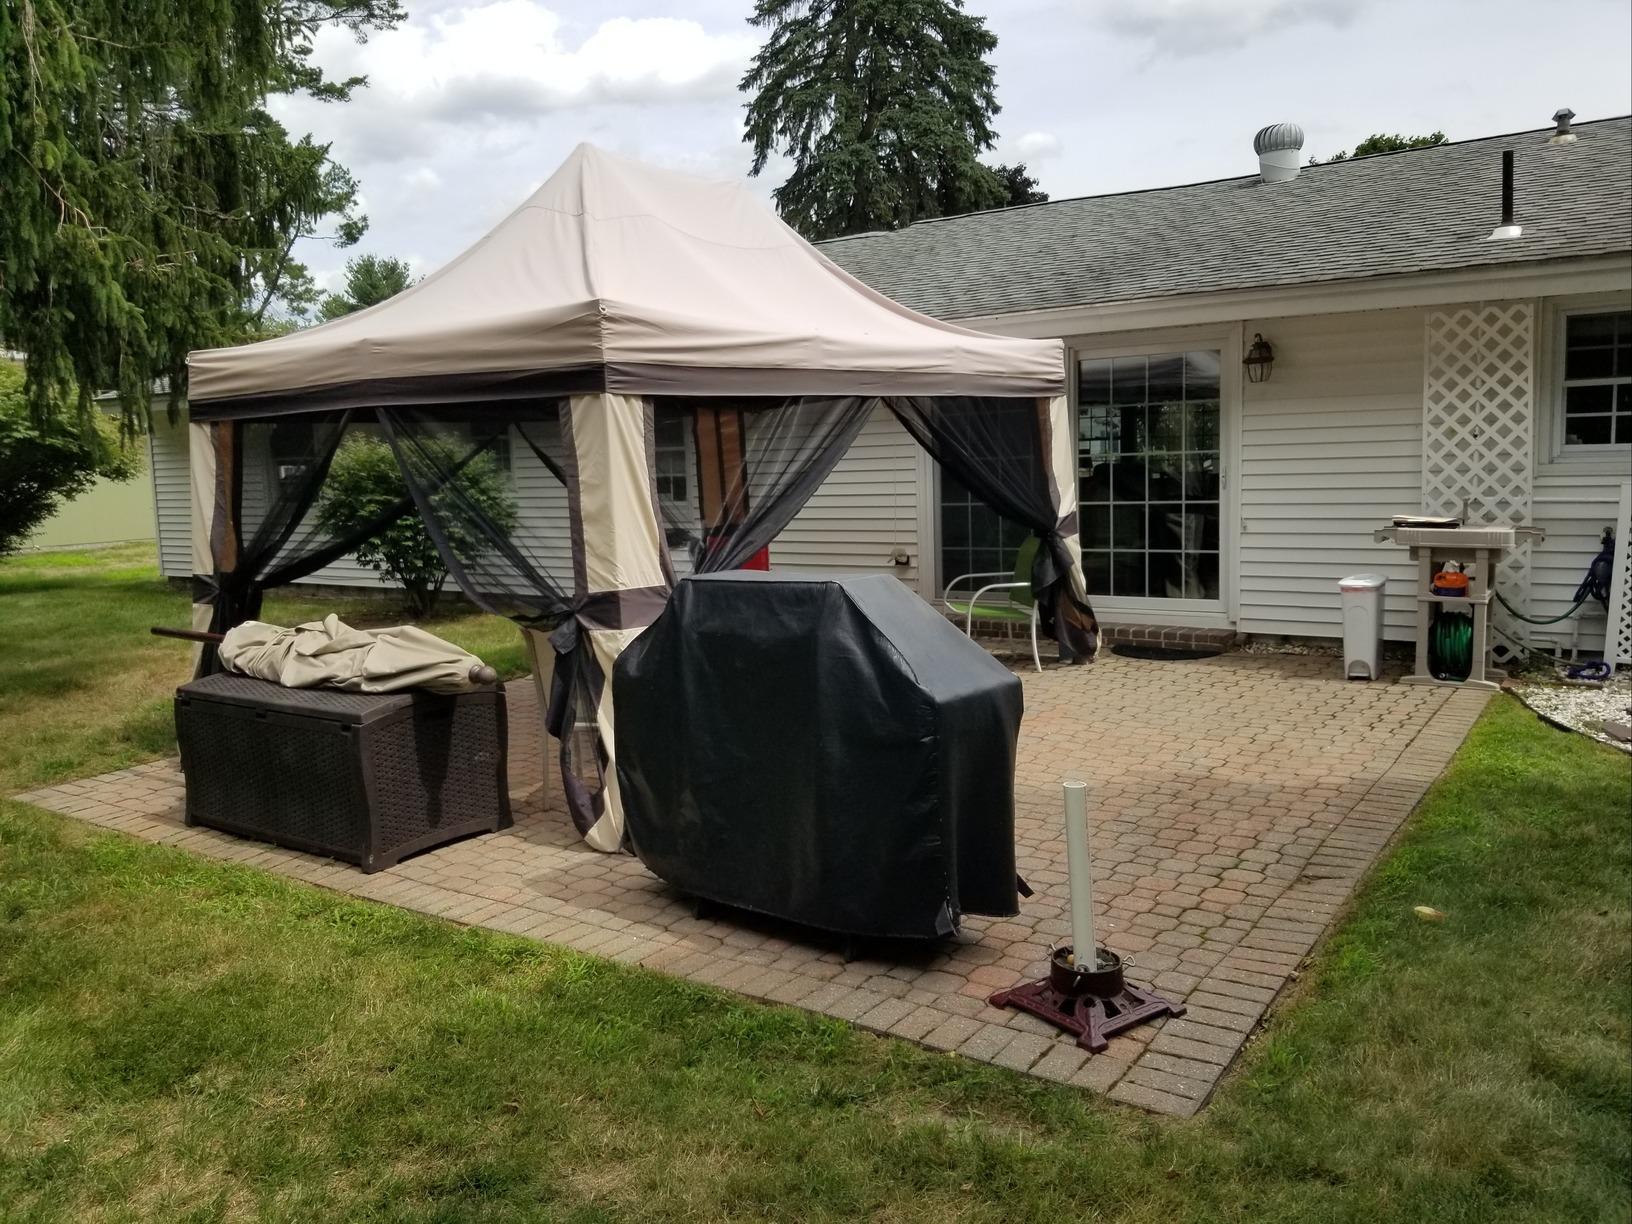 4-Season Sunroom Installation Built in Hudson, NH - Before Photo